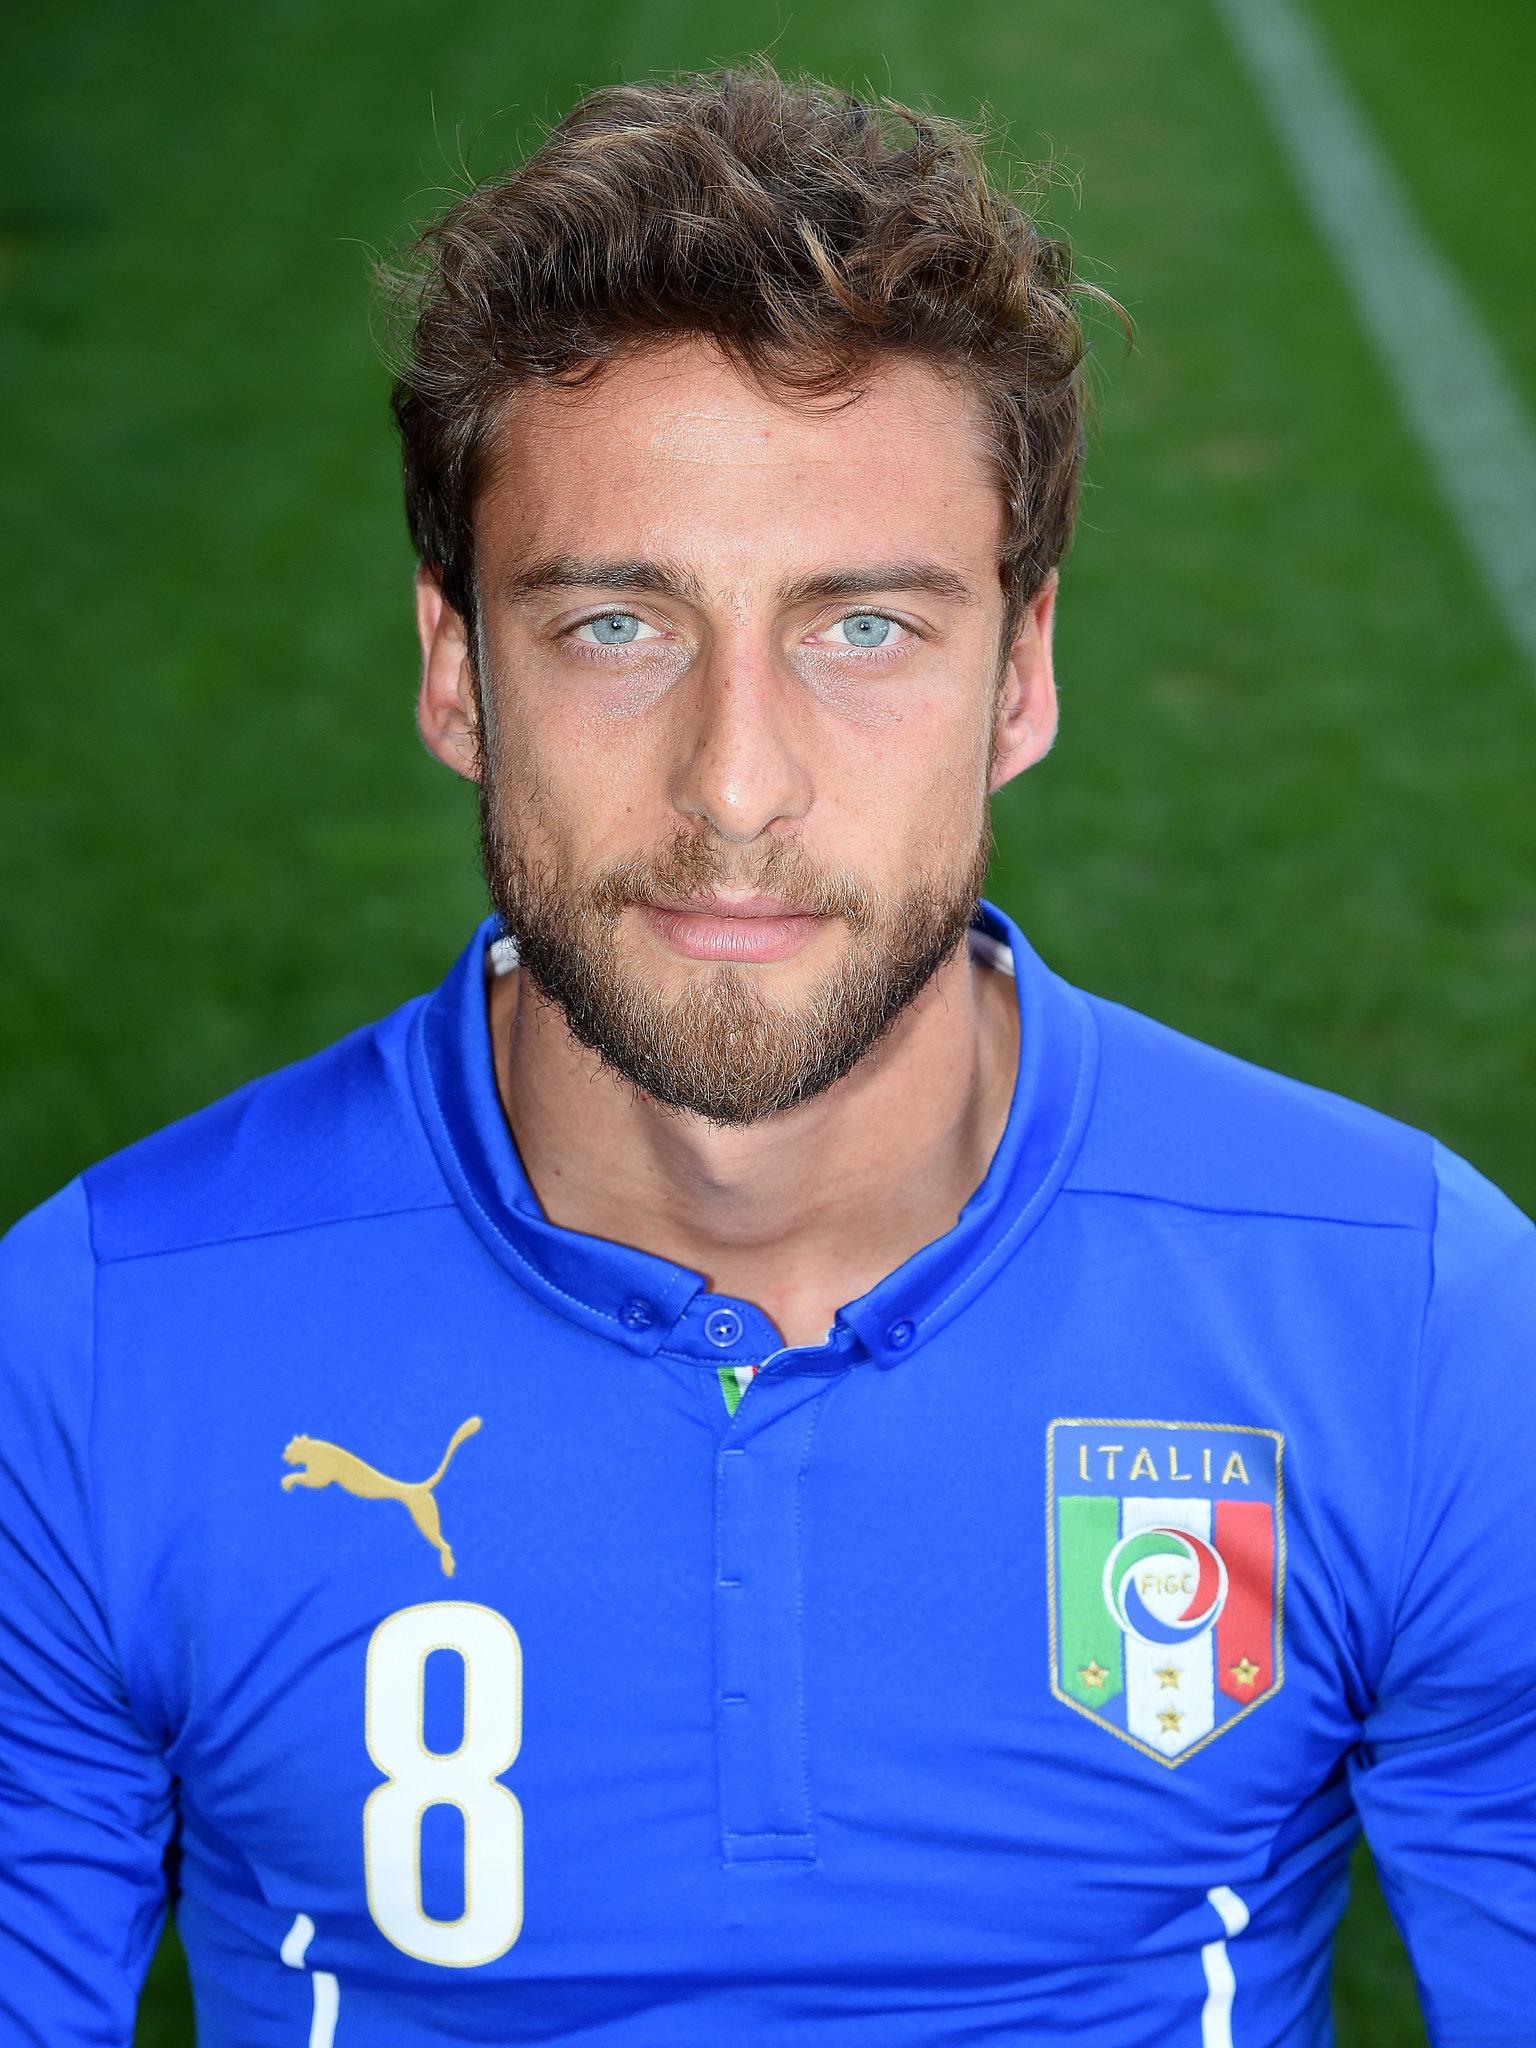 http://media2.popsugar-assets.com/files/2014/06/13/783/n/1922398/a63785cbaa6b5731_495409977_10.xxxlarge_2x/i/Claudio-Marchisio-Italy.jpg